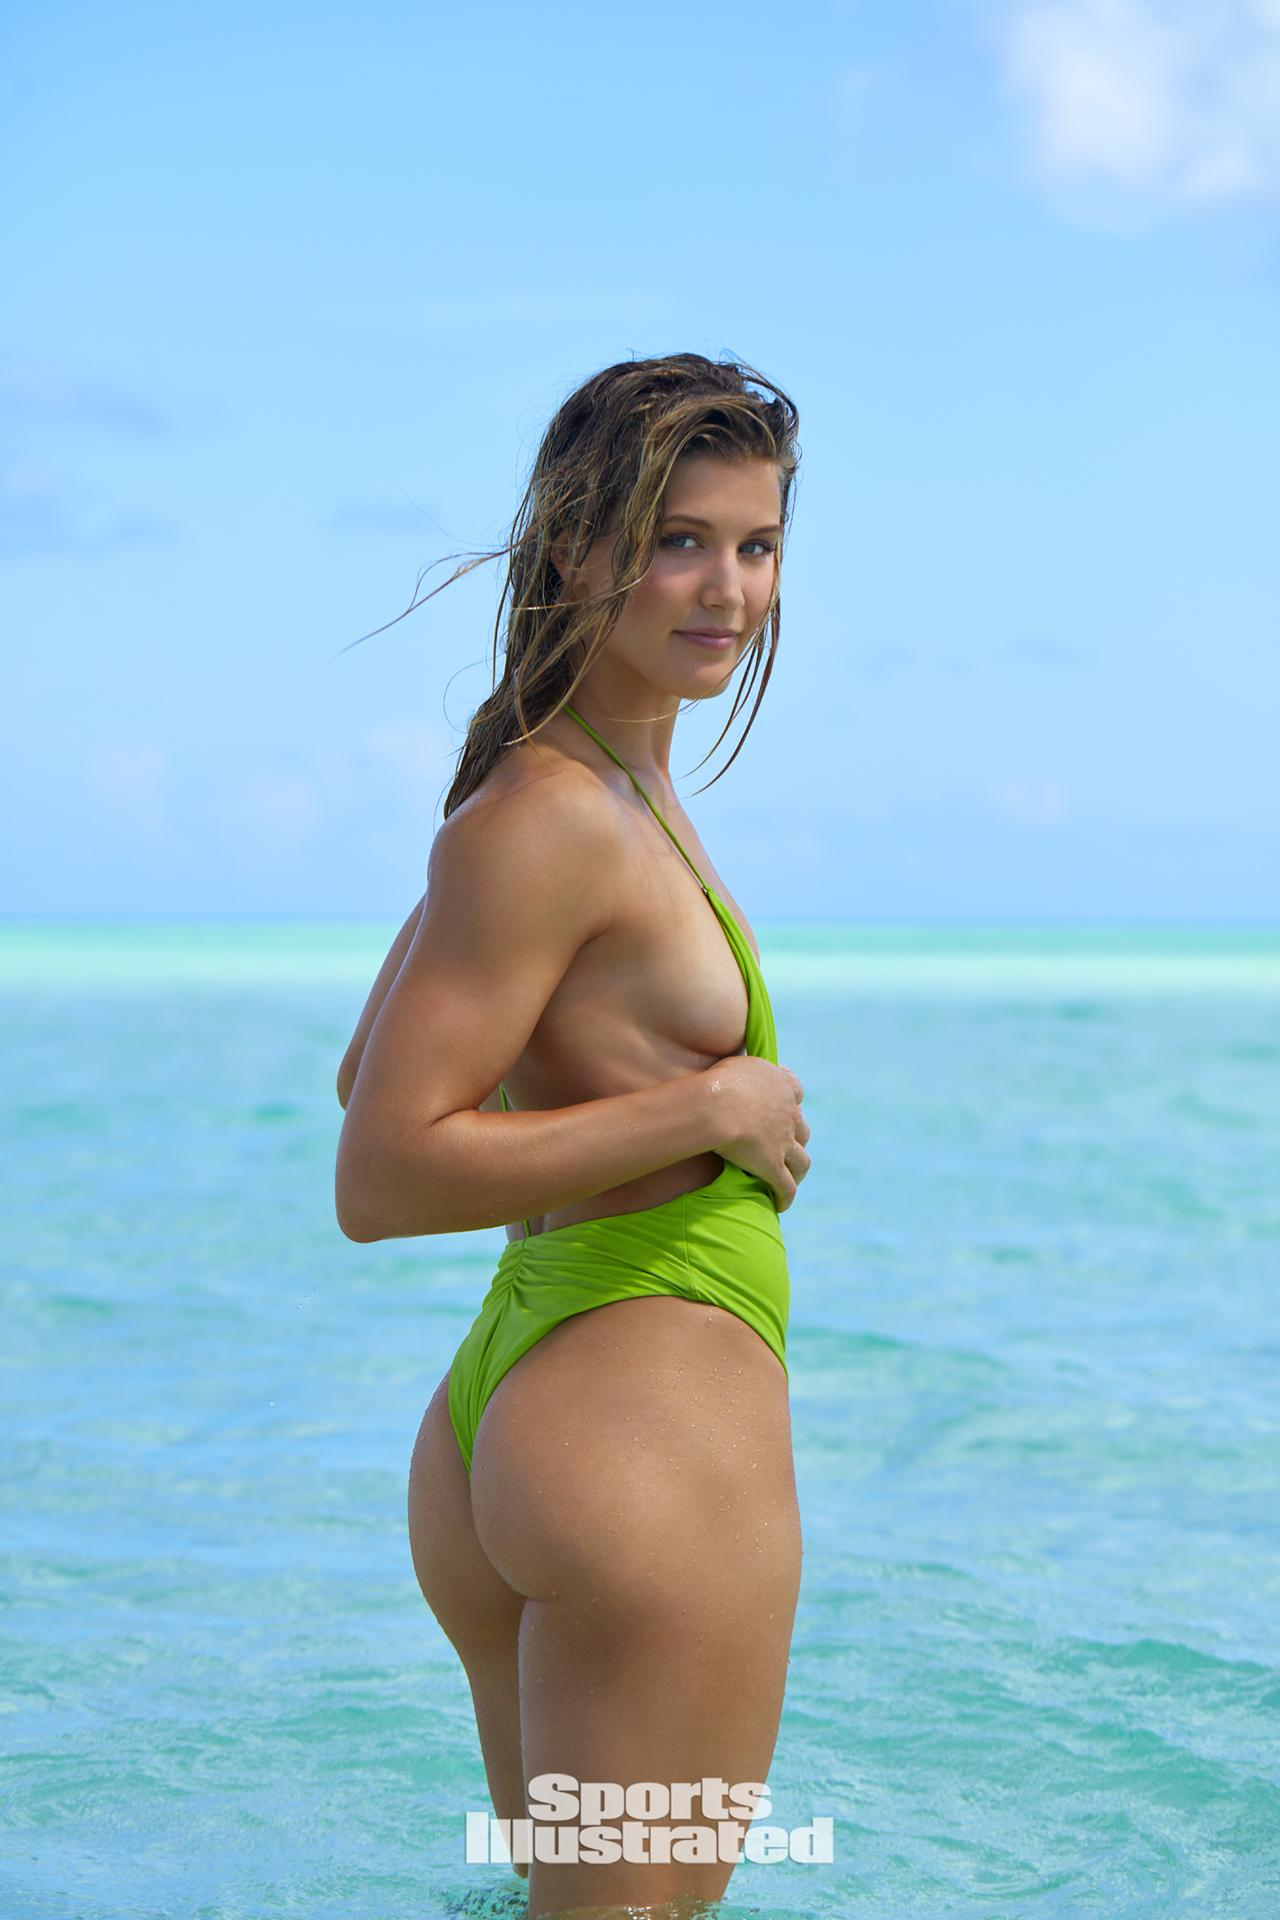 geenie in a string bikini